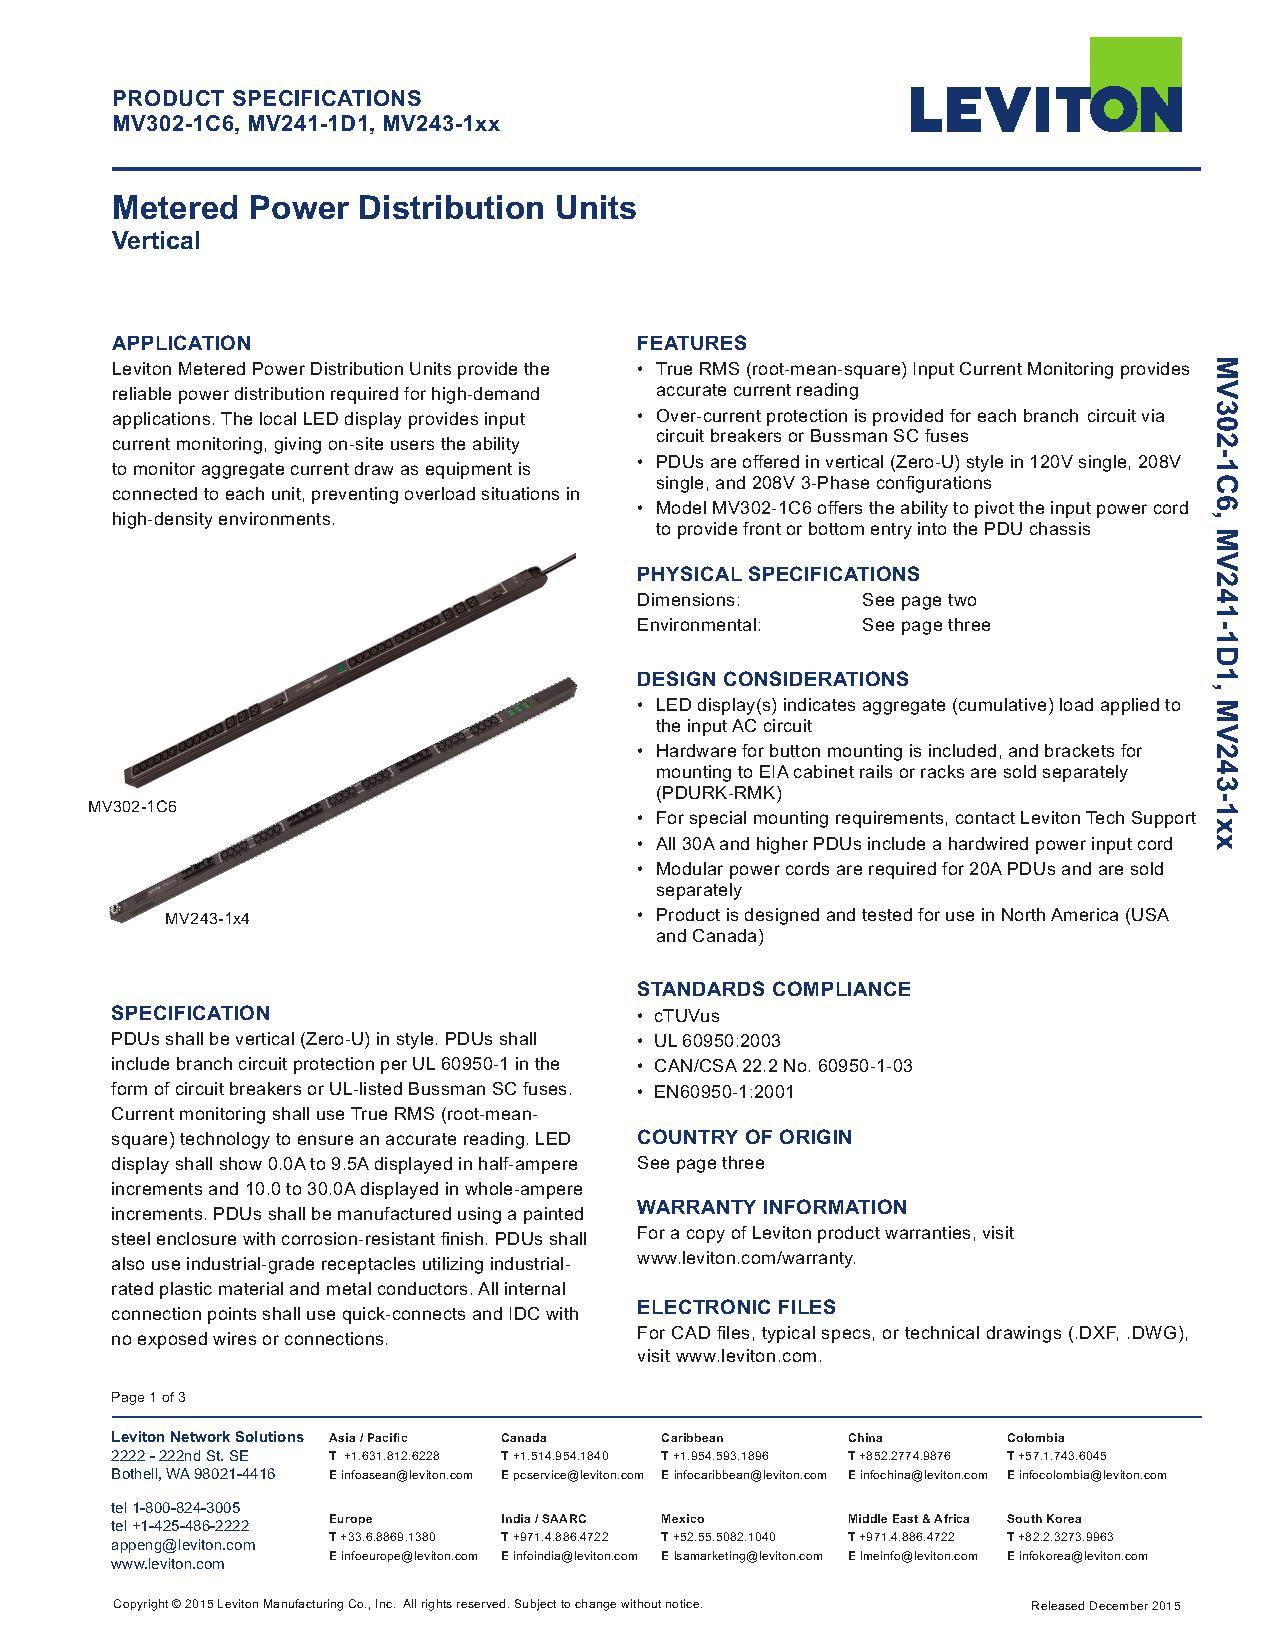 Leviton Metered Power Distribution Units   AJB Sales